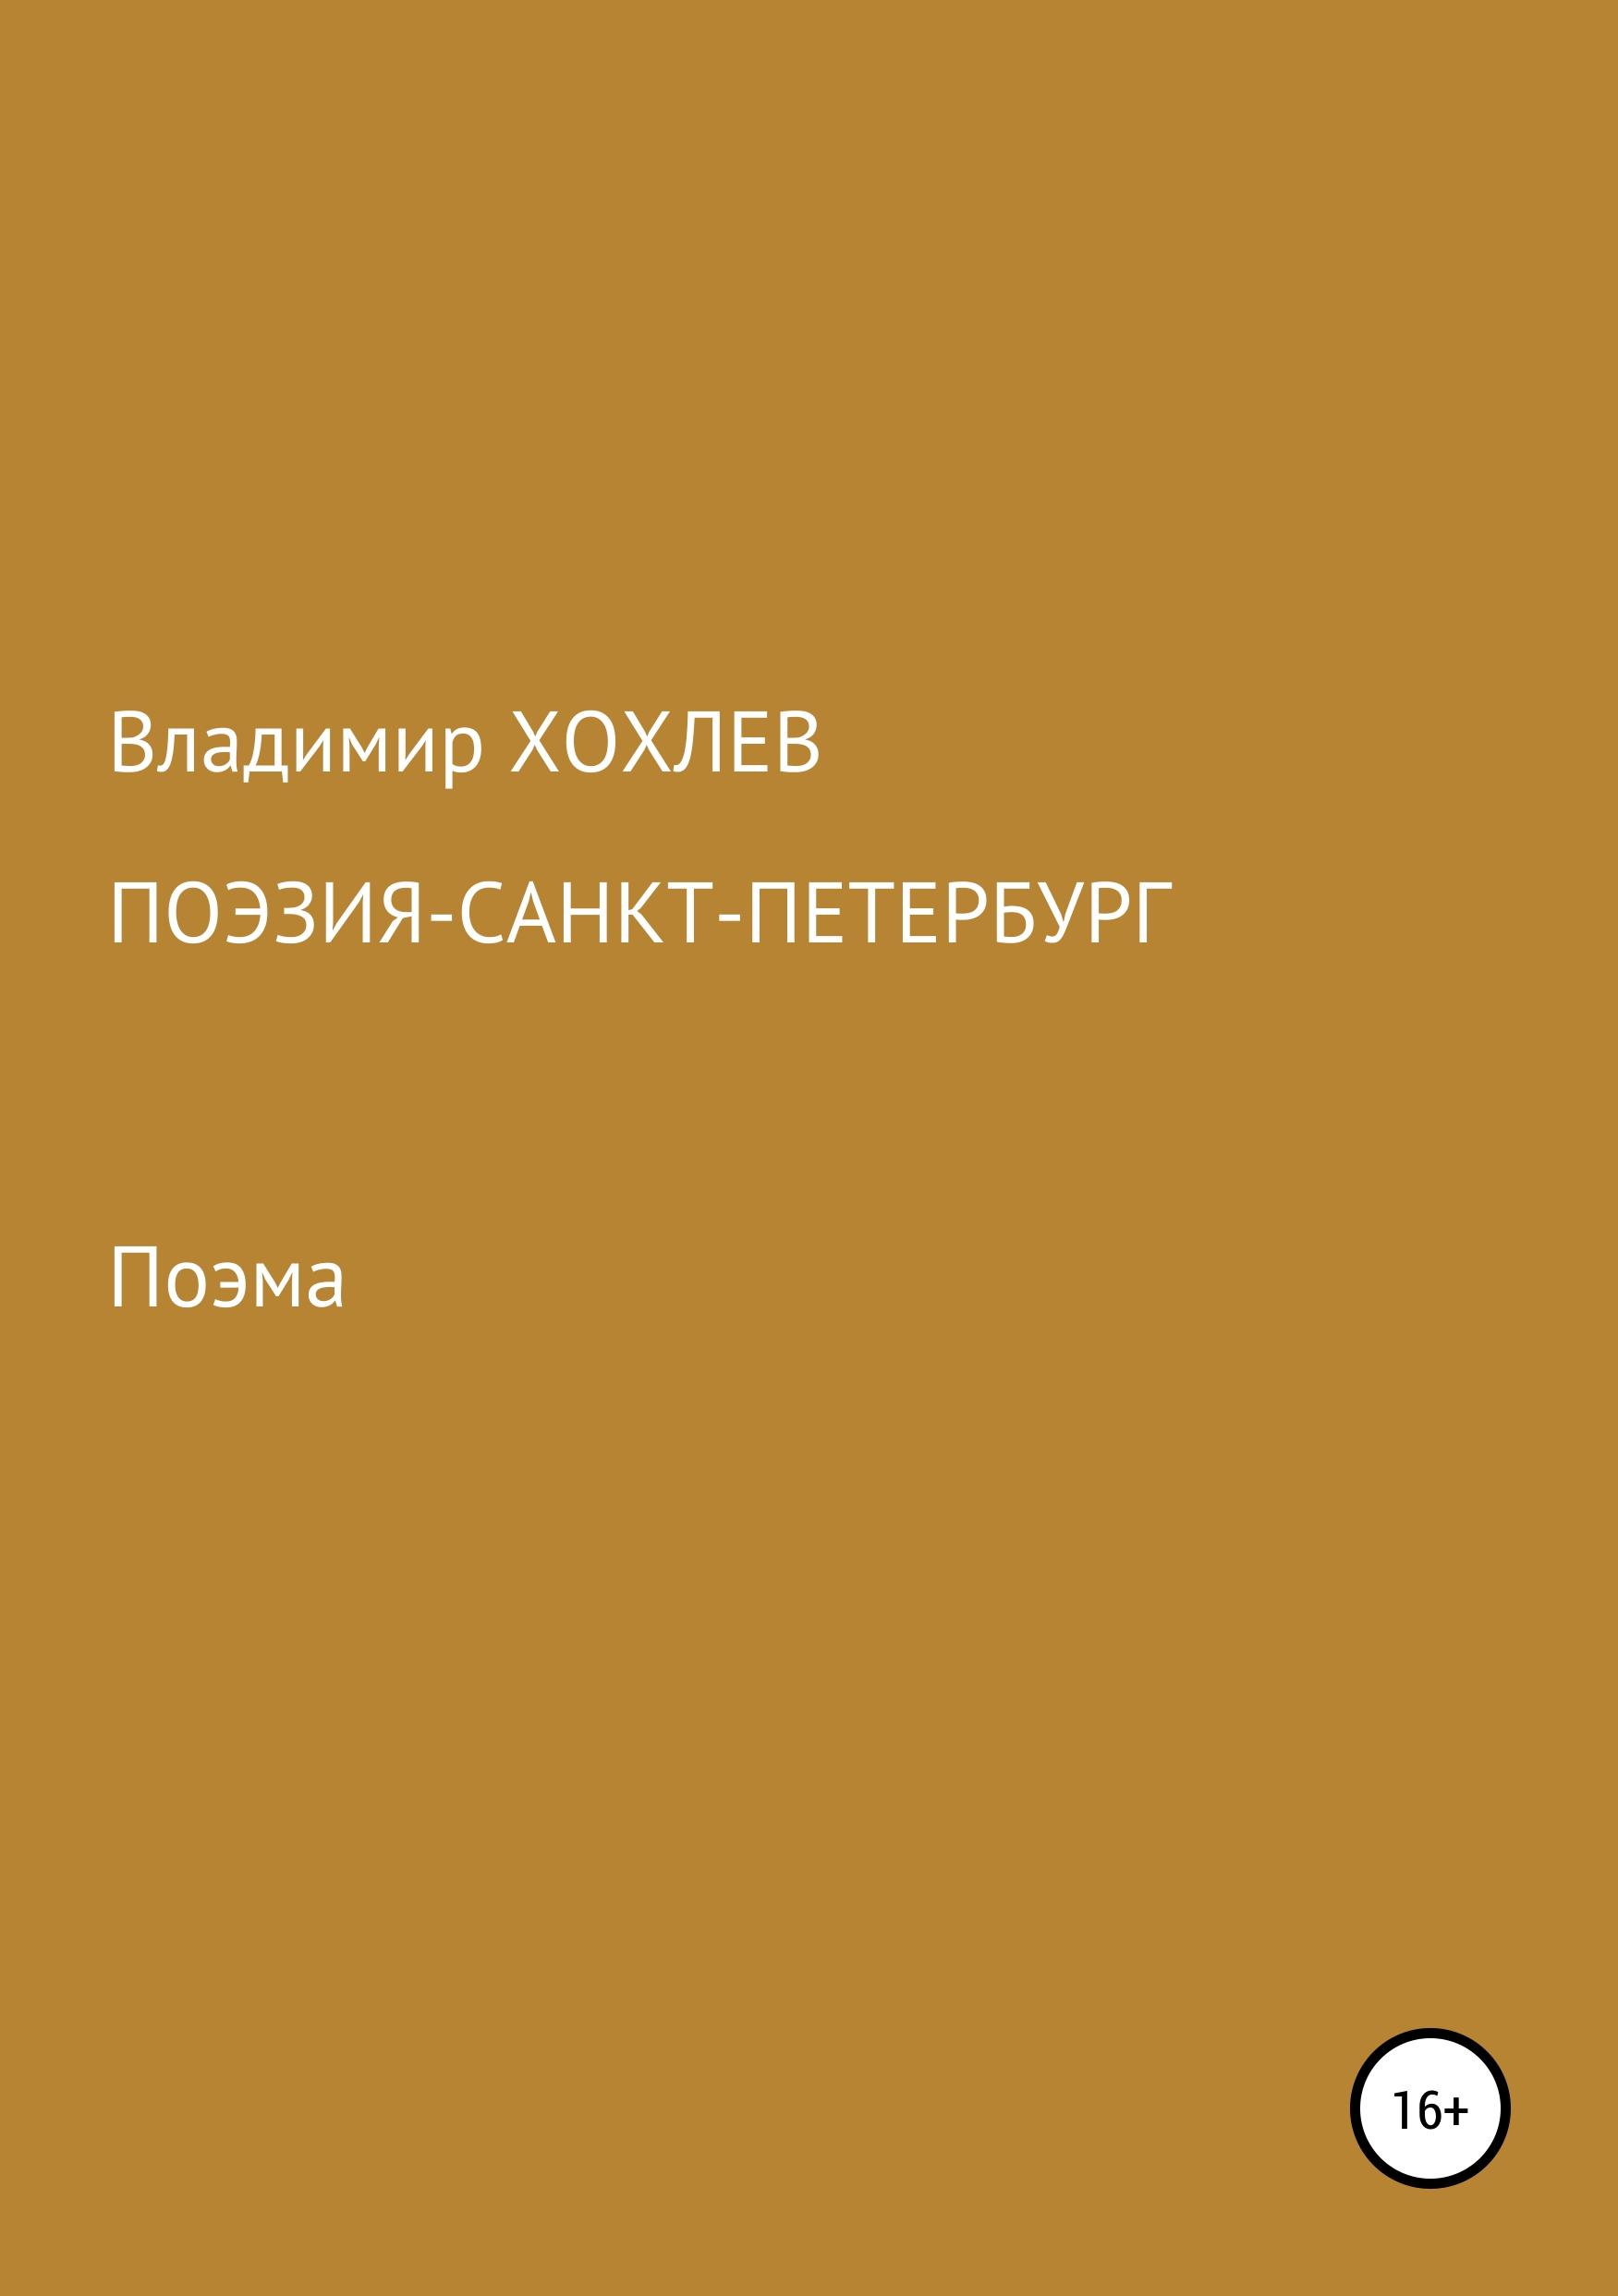 Владимир Хохлев Поэзия – Санкт-Петербург